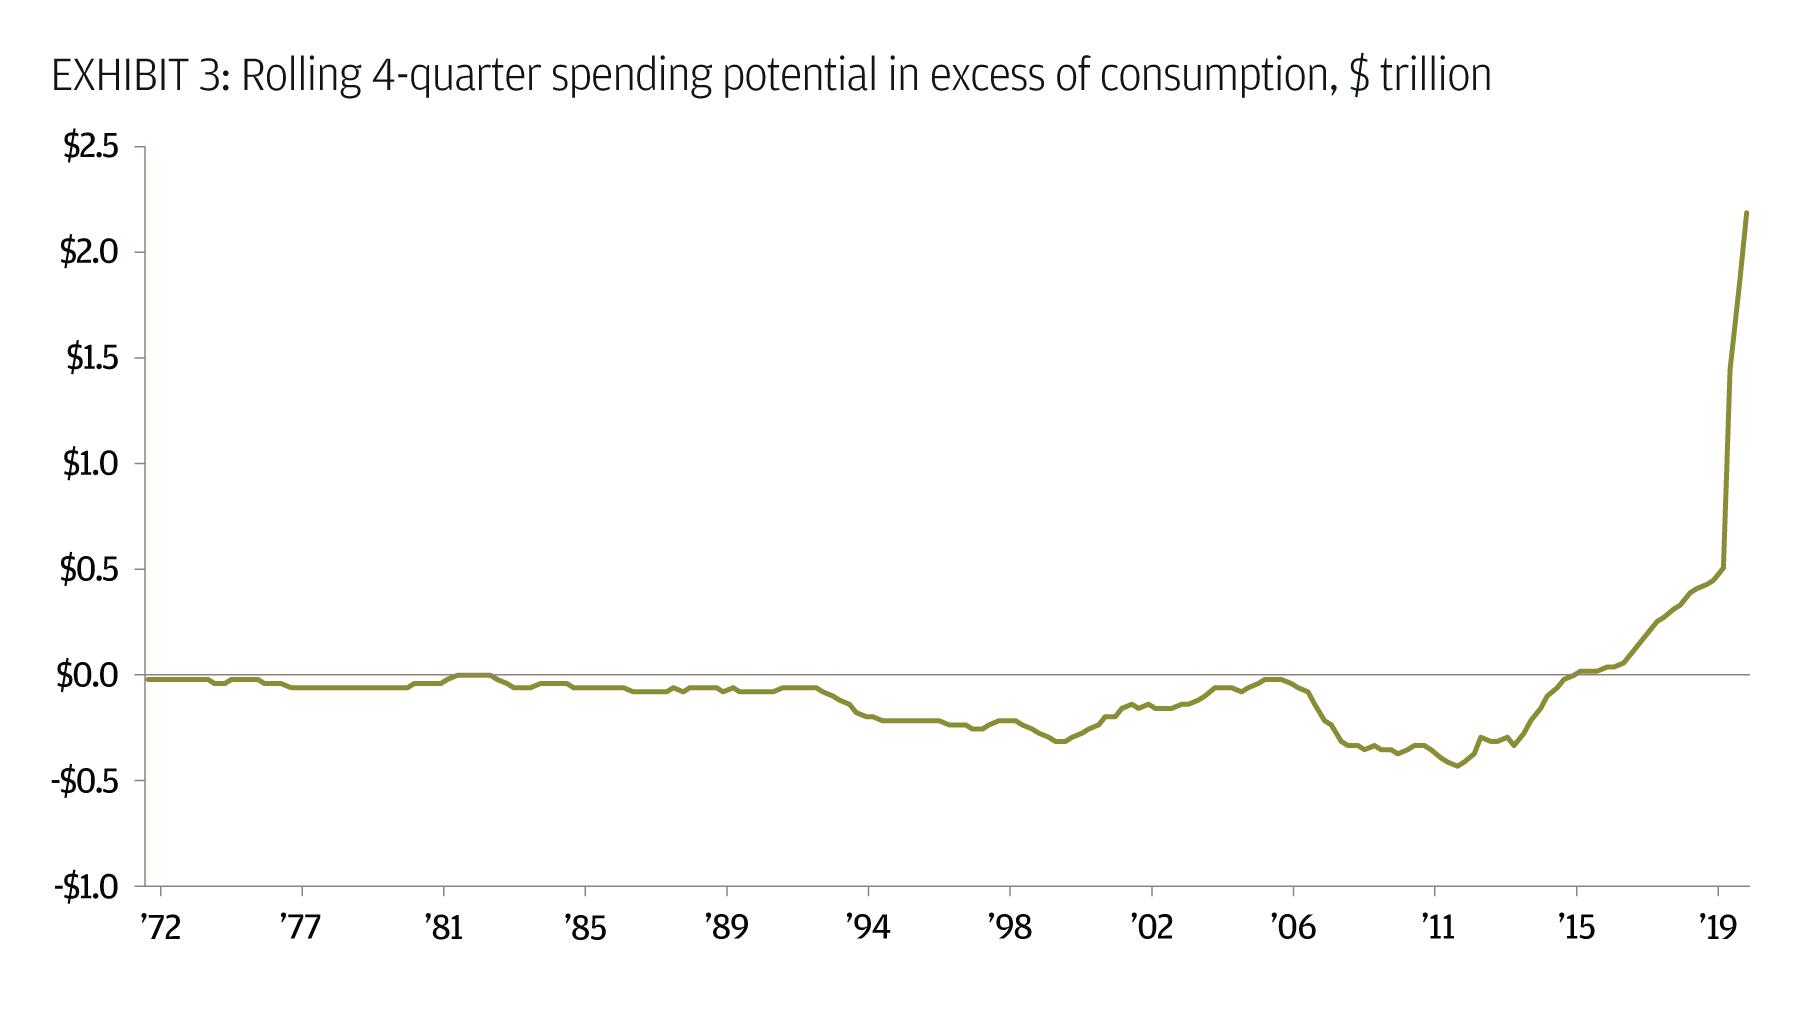 Rolling 4-quarter spending